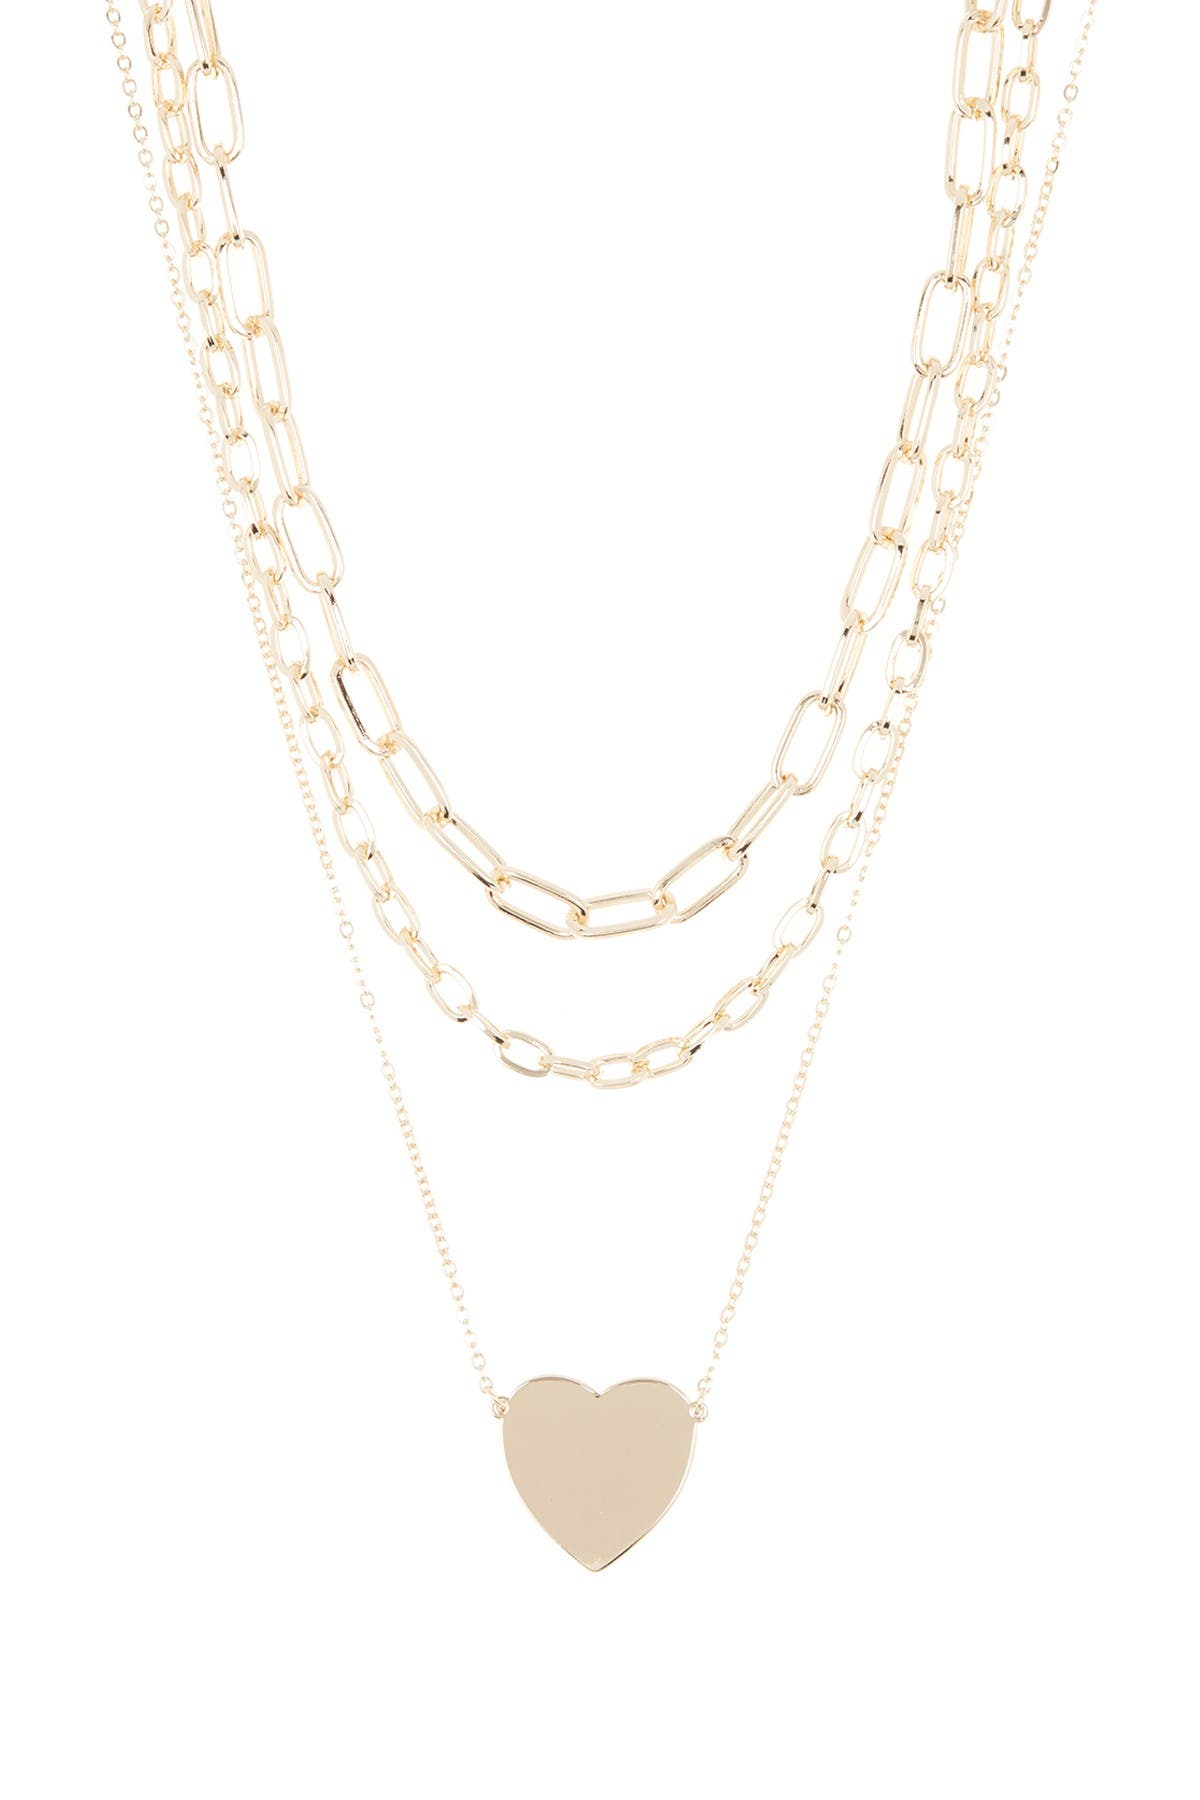 Image of Panacea Layered Heart Pendant Necklace